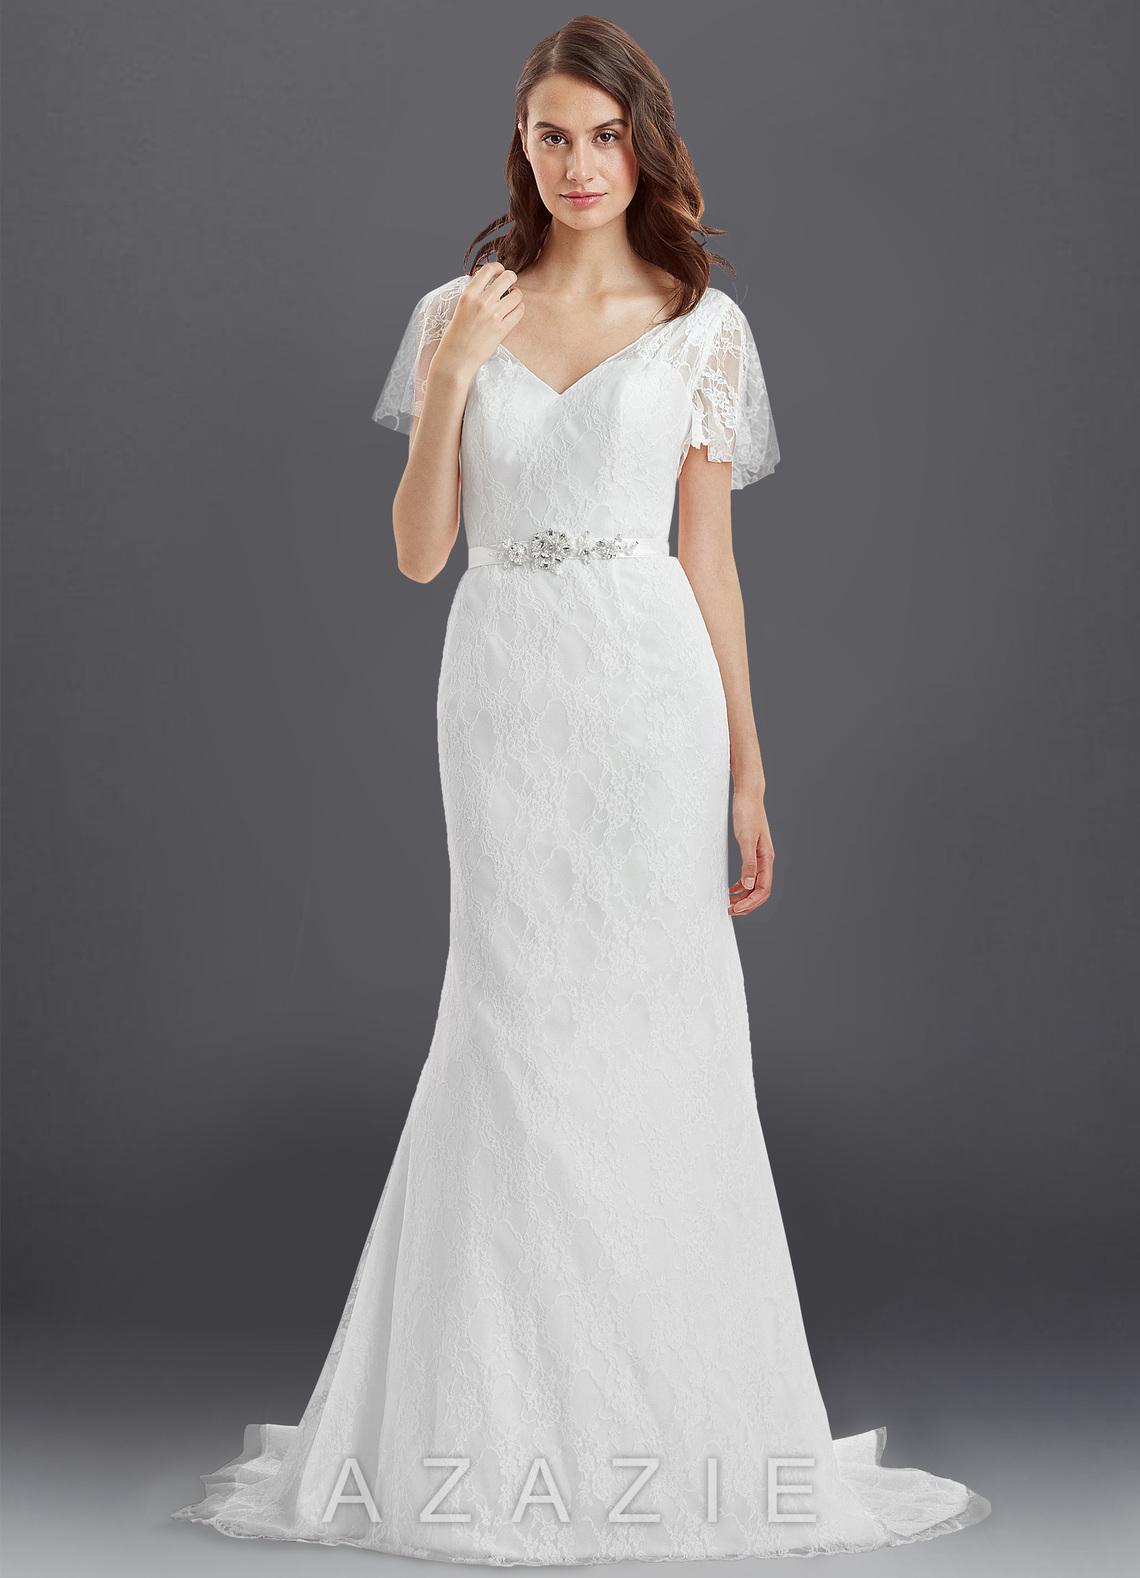 34a16706472 Azazie Dylan BG Wedding Dress